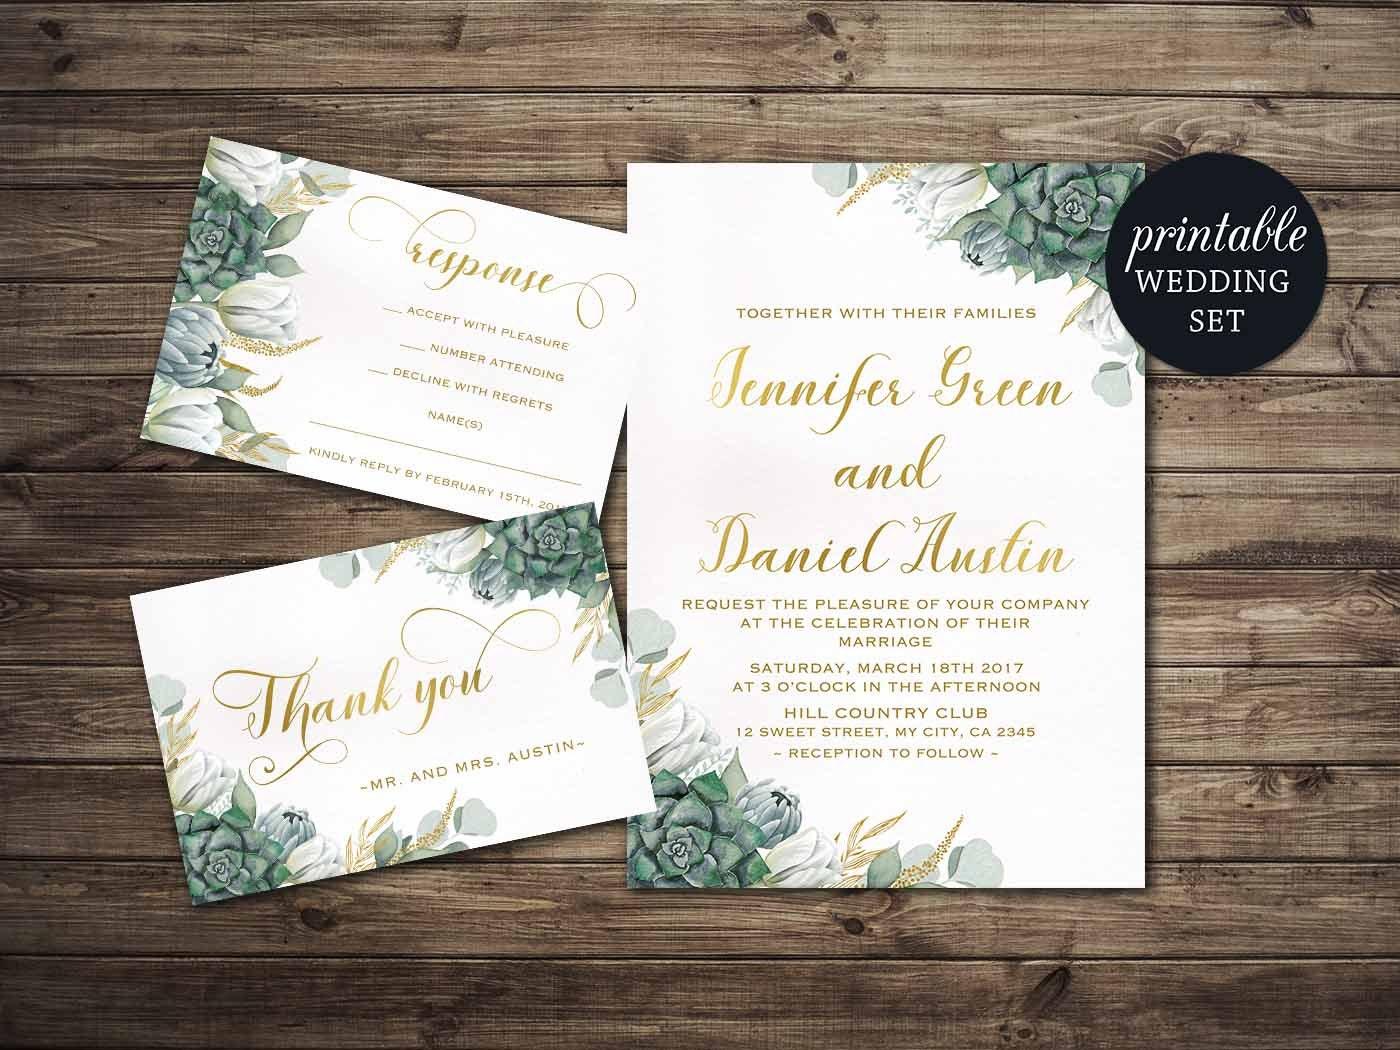 Print Out Wedding Invitations: Printable Wedding Invitation Floral Wedding Invitation Set